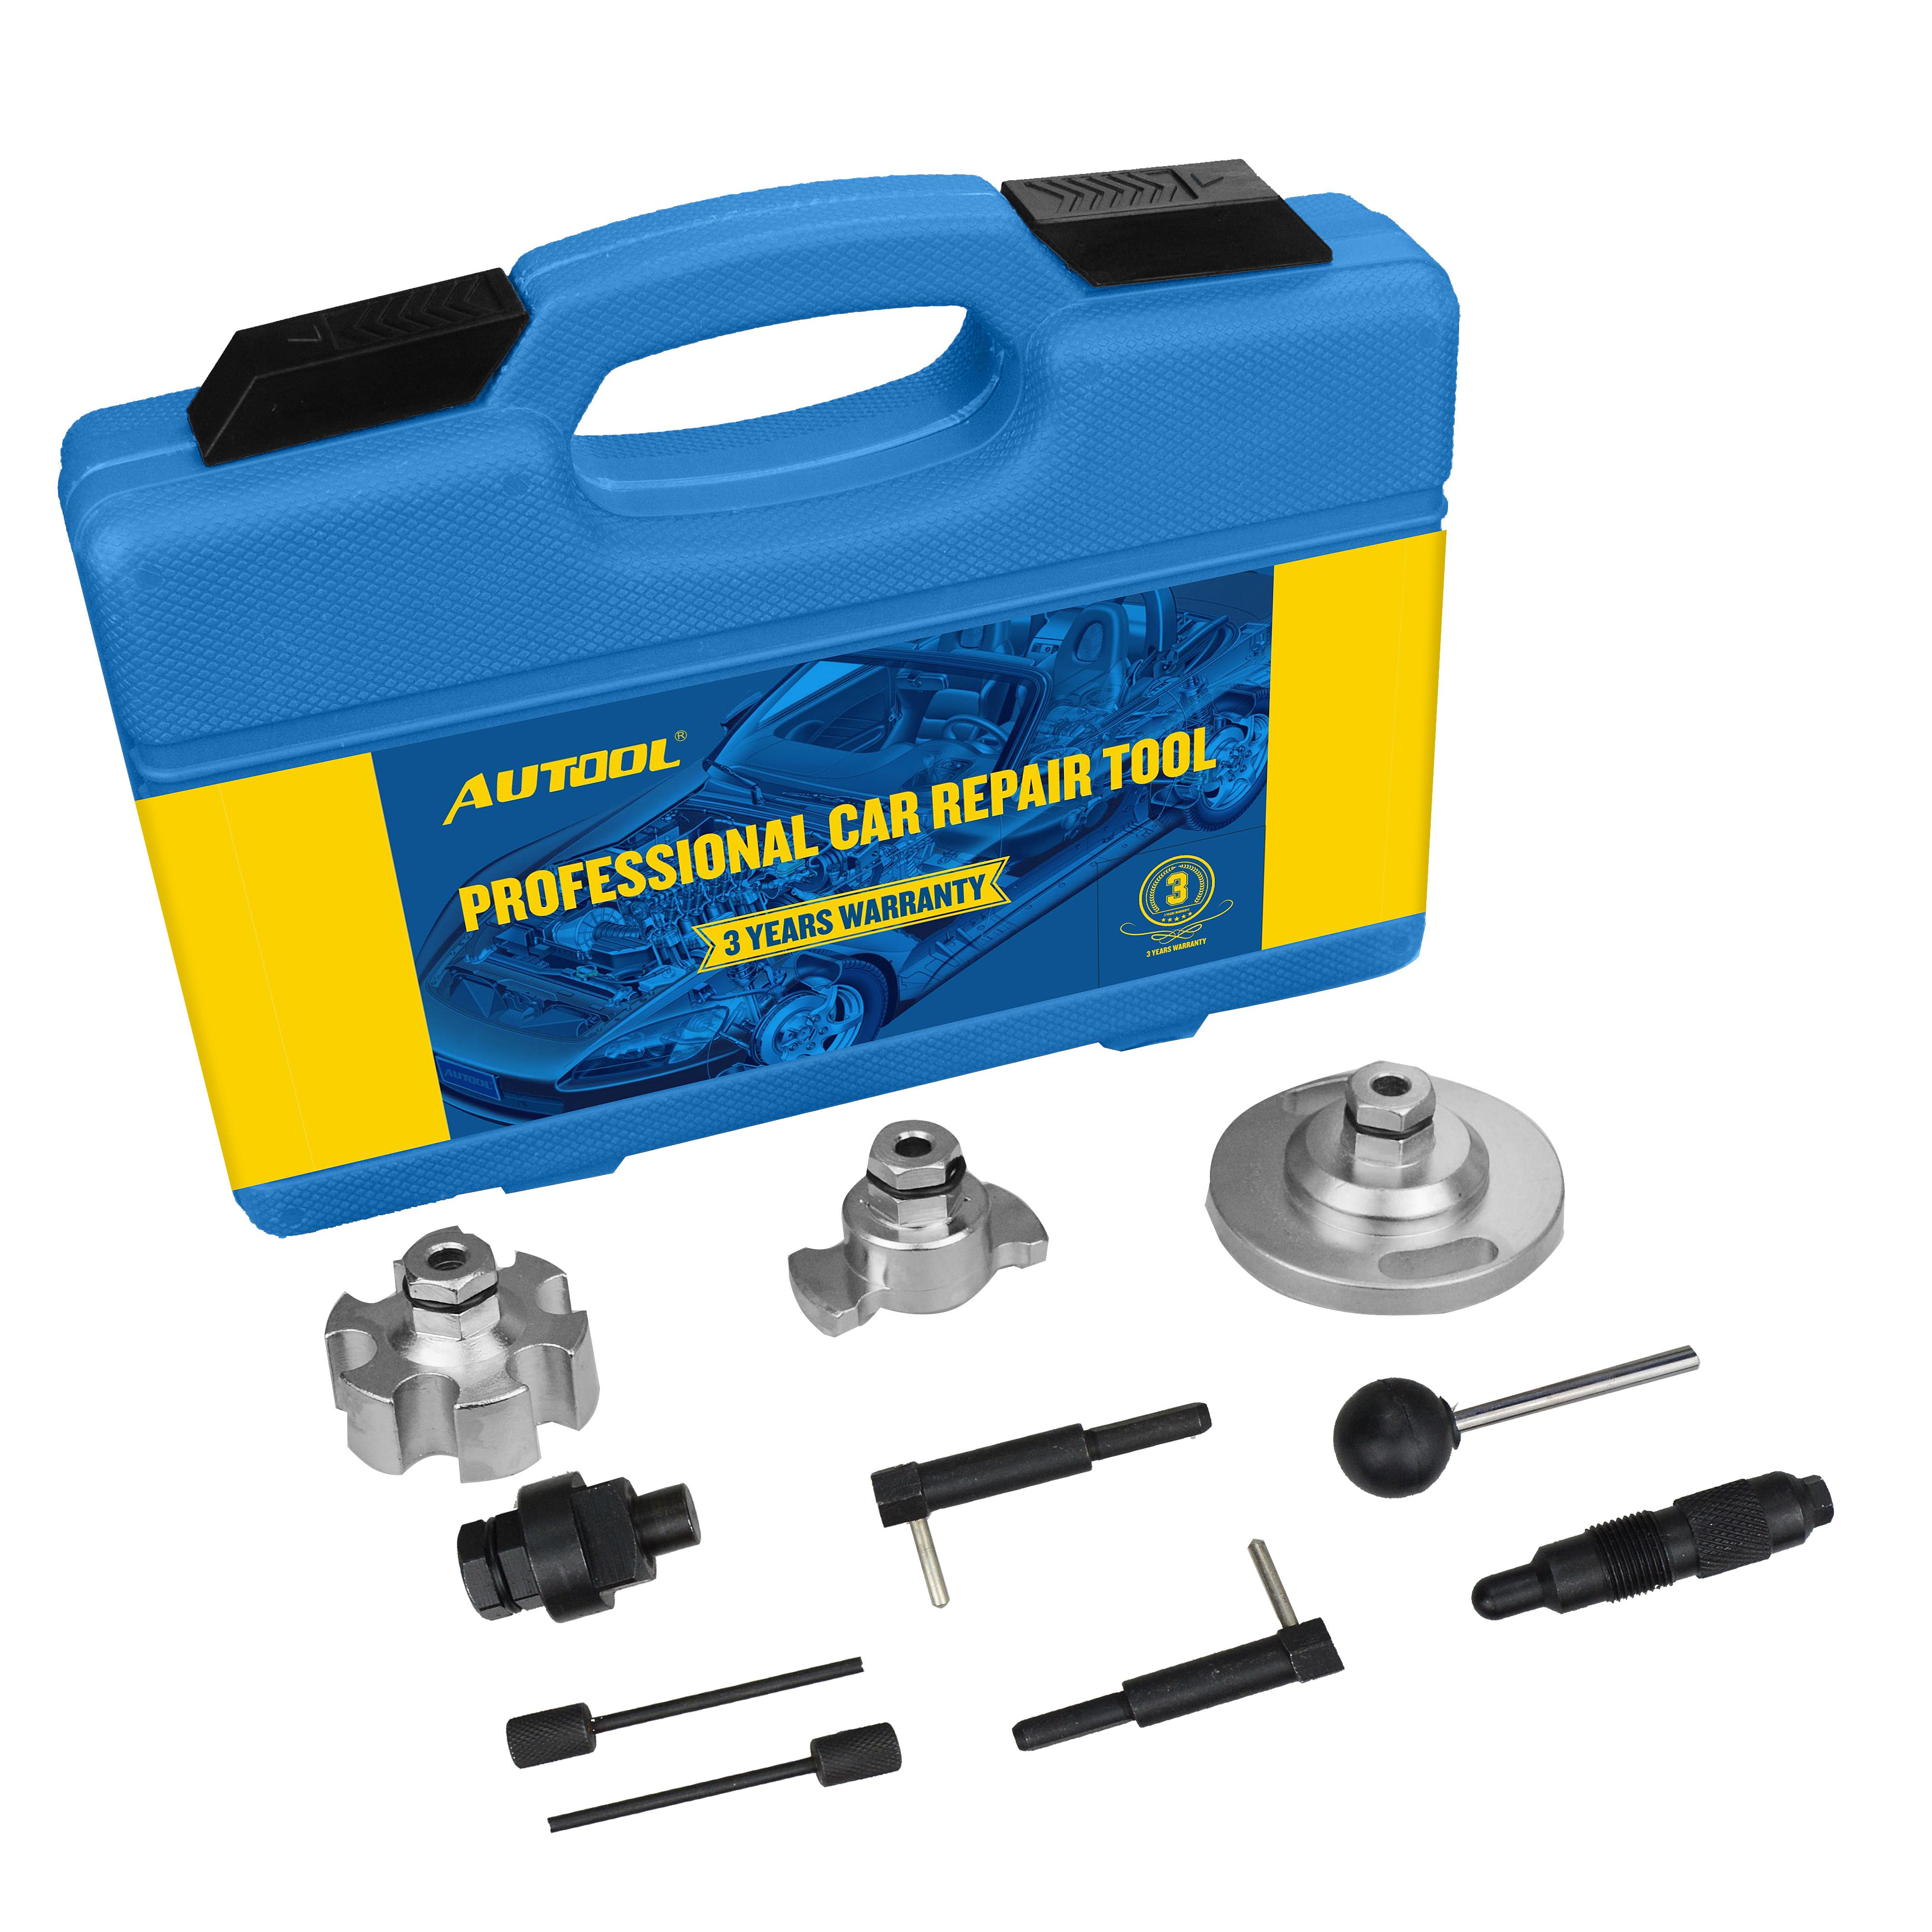 Herramienta-de-sincronizacion-del-arbol-de-levas-motor-para-Audi-A4-A5-A6-VW-Touareg-Phaeton-2-7-3